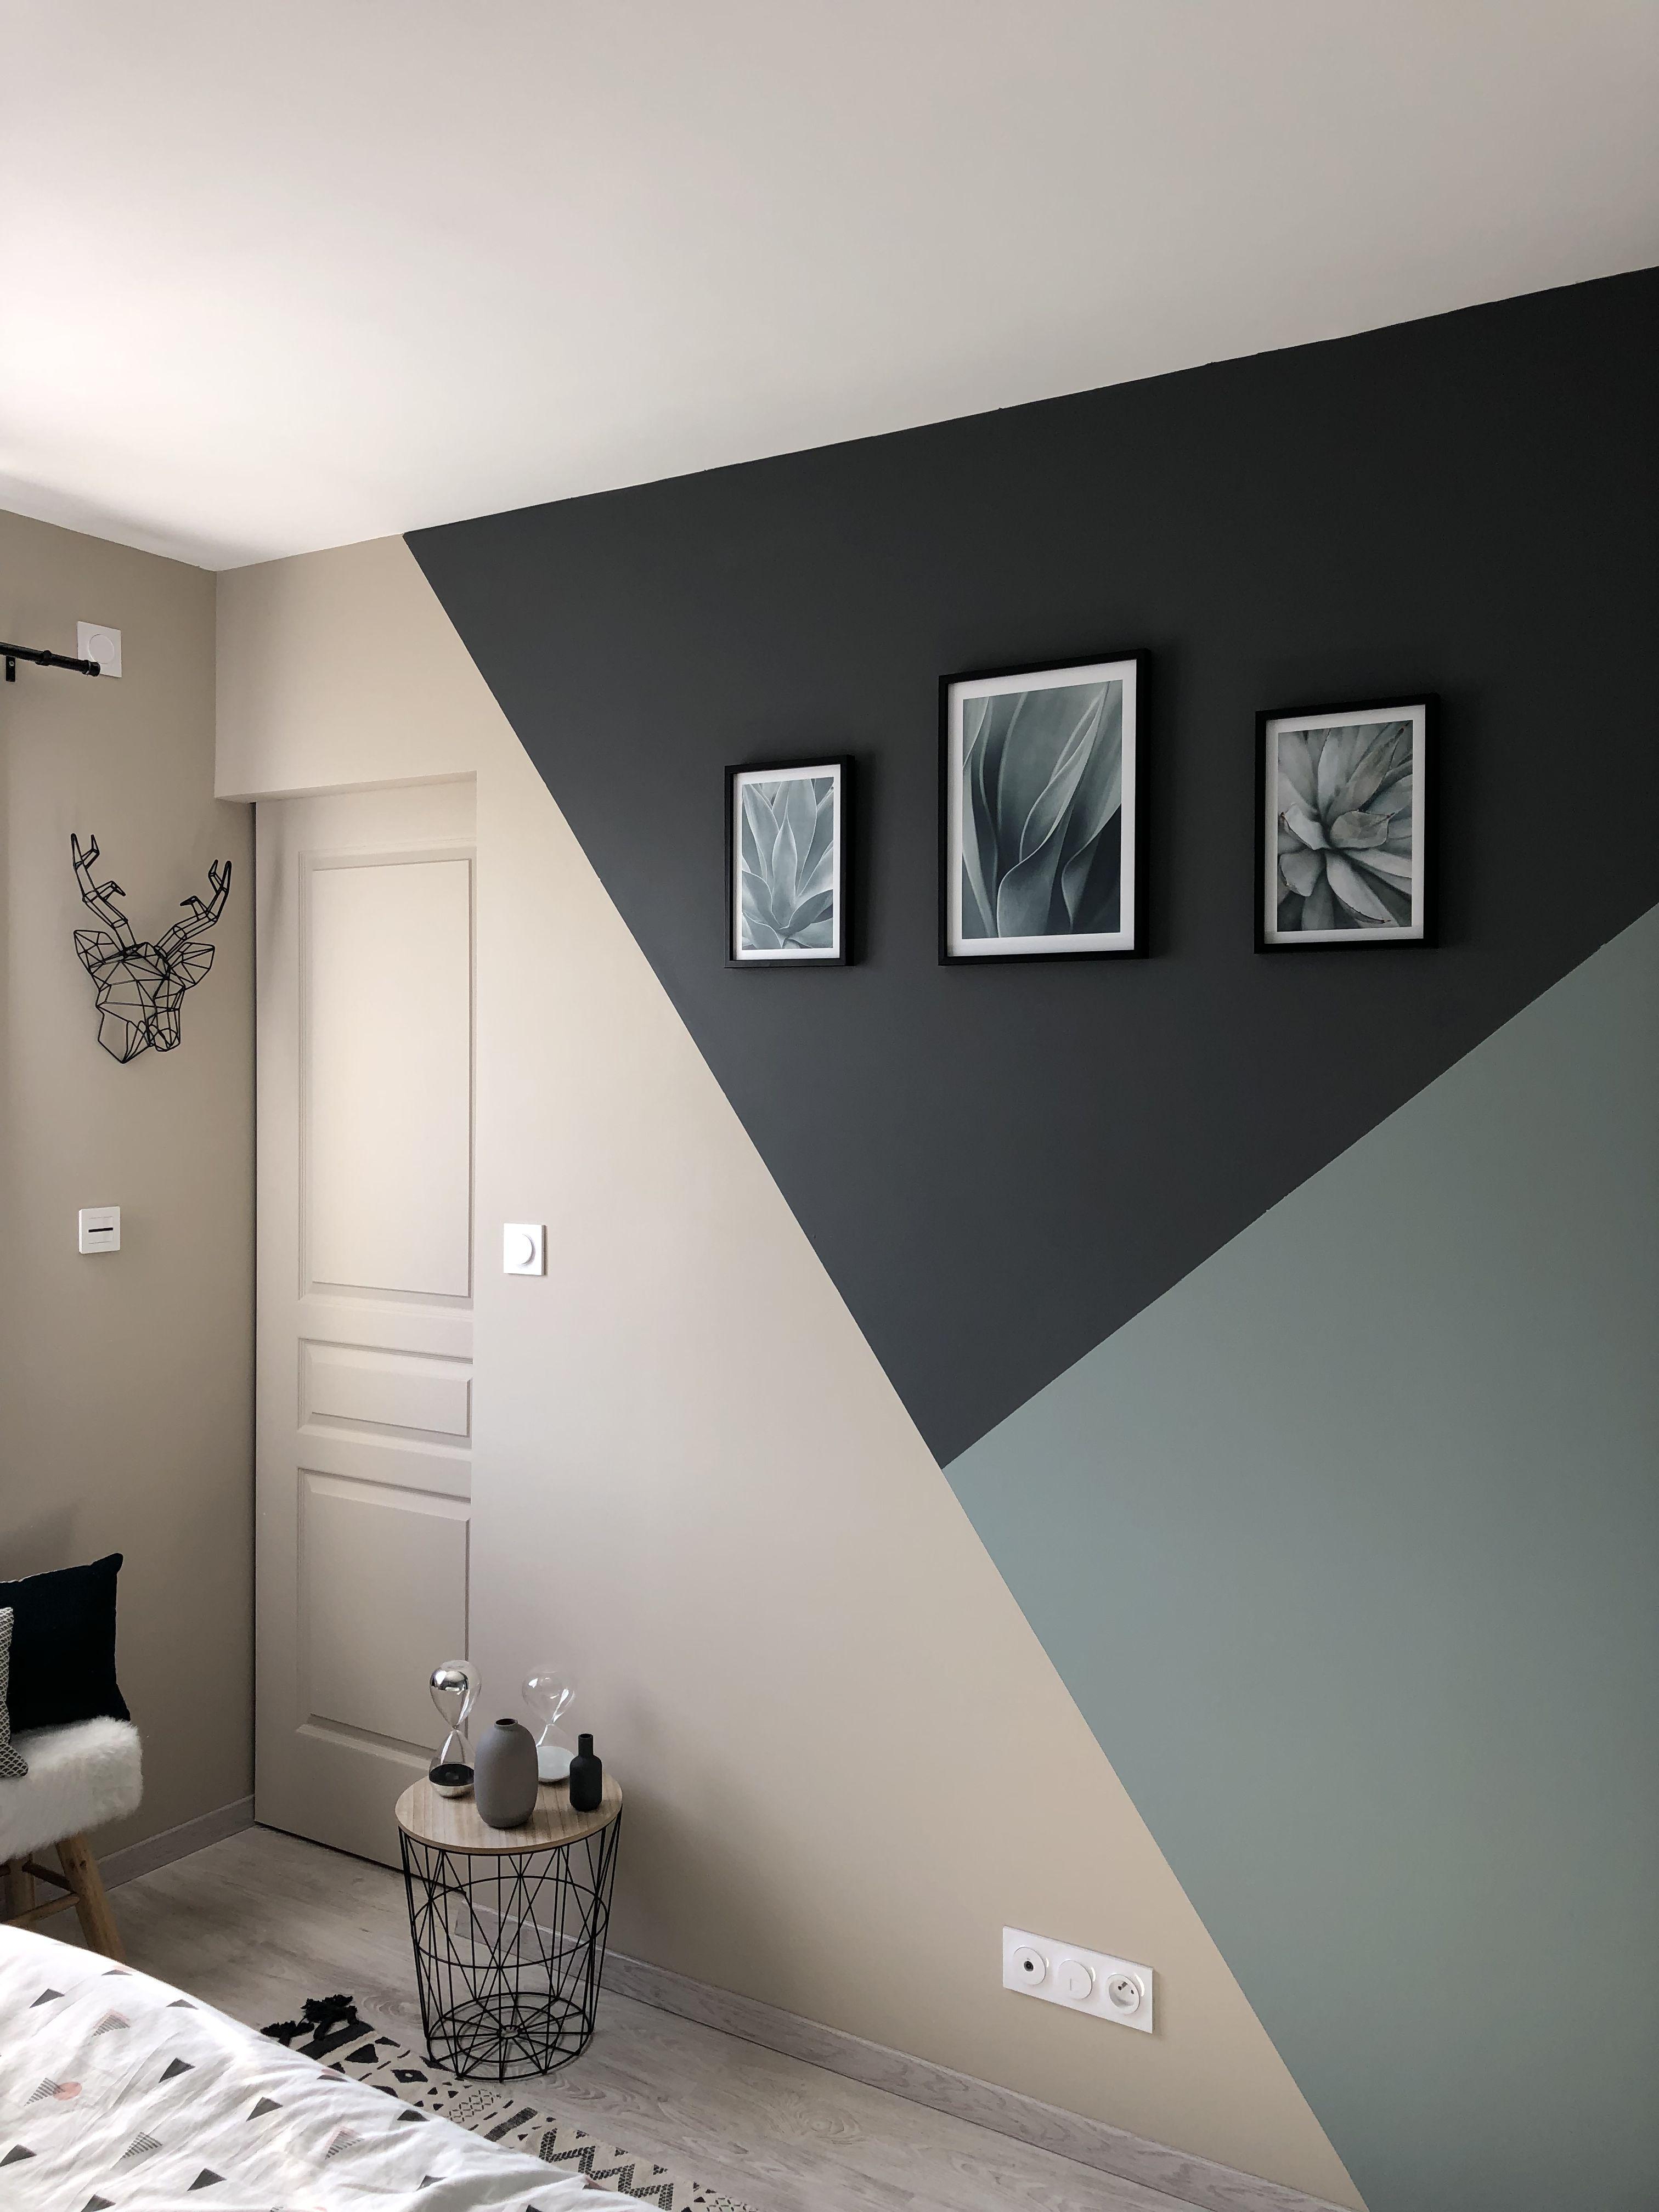 Notre Chambre Parentale Deco Chambre With Images Bedroom